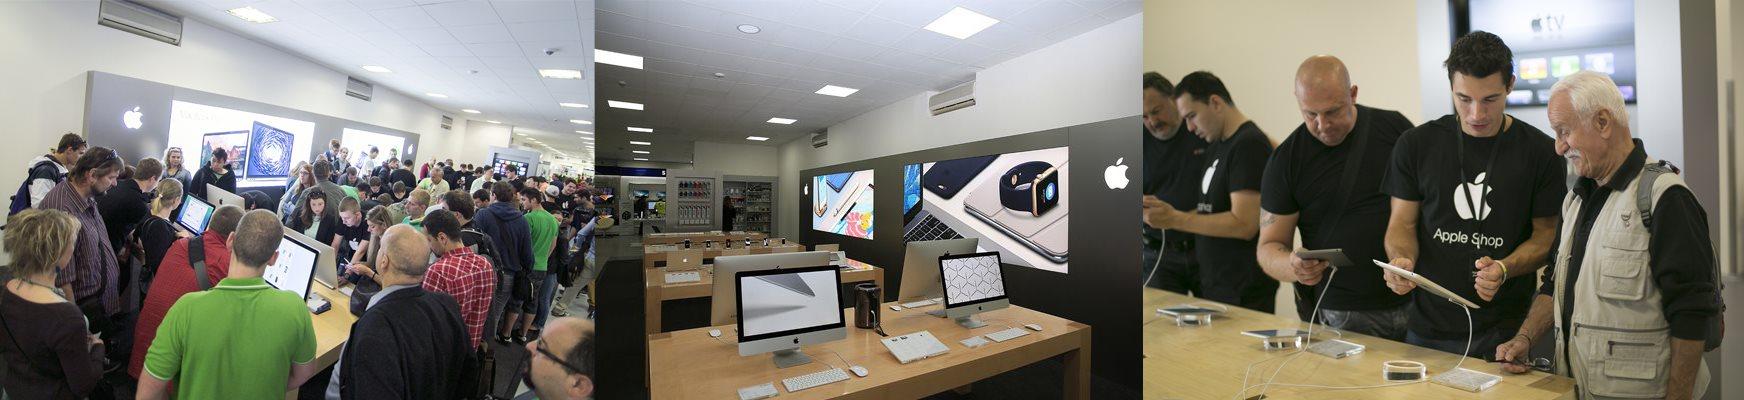 Holešovický showroom Alza.cz: Apple